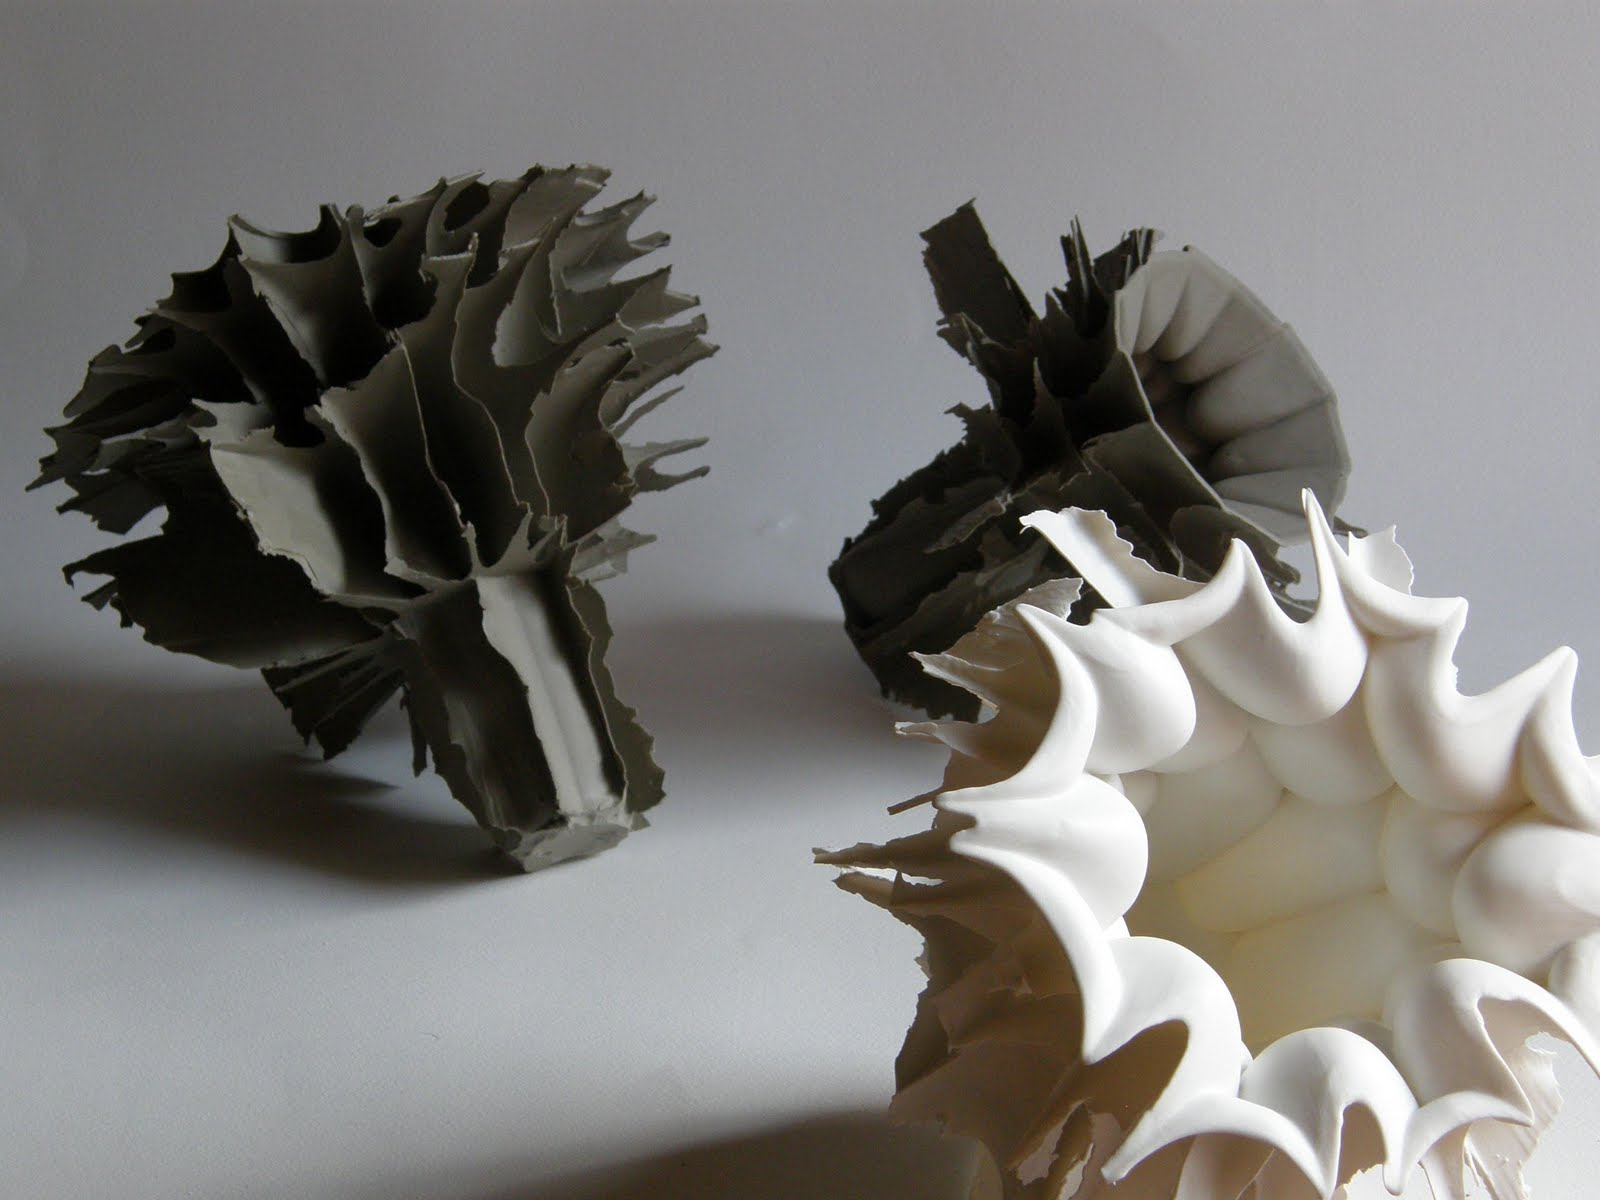 Simon Zsolt ceramics via Eclectic Trends